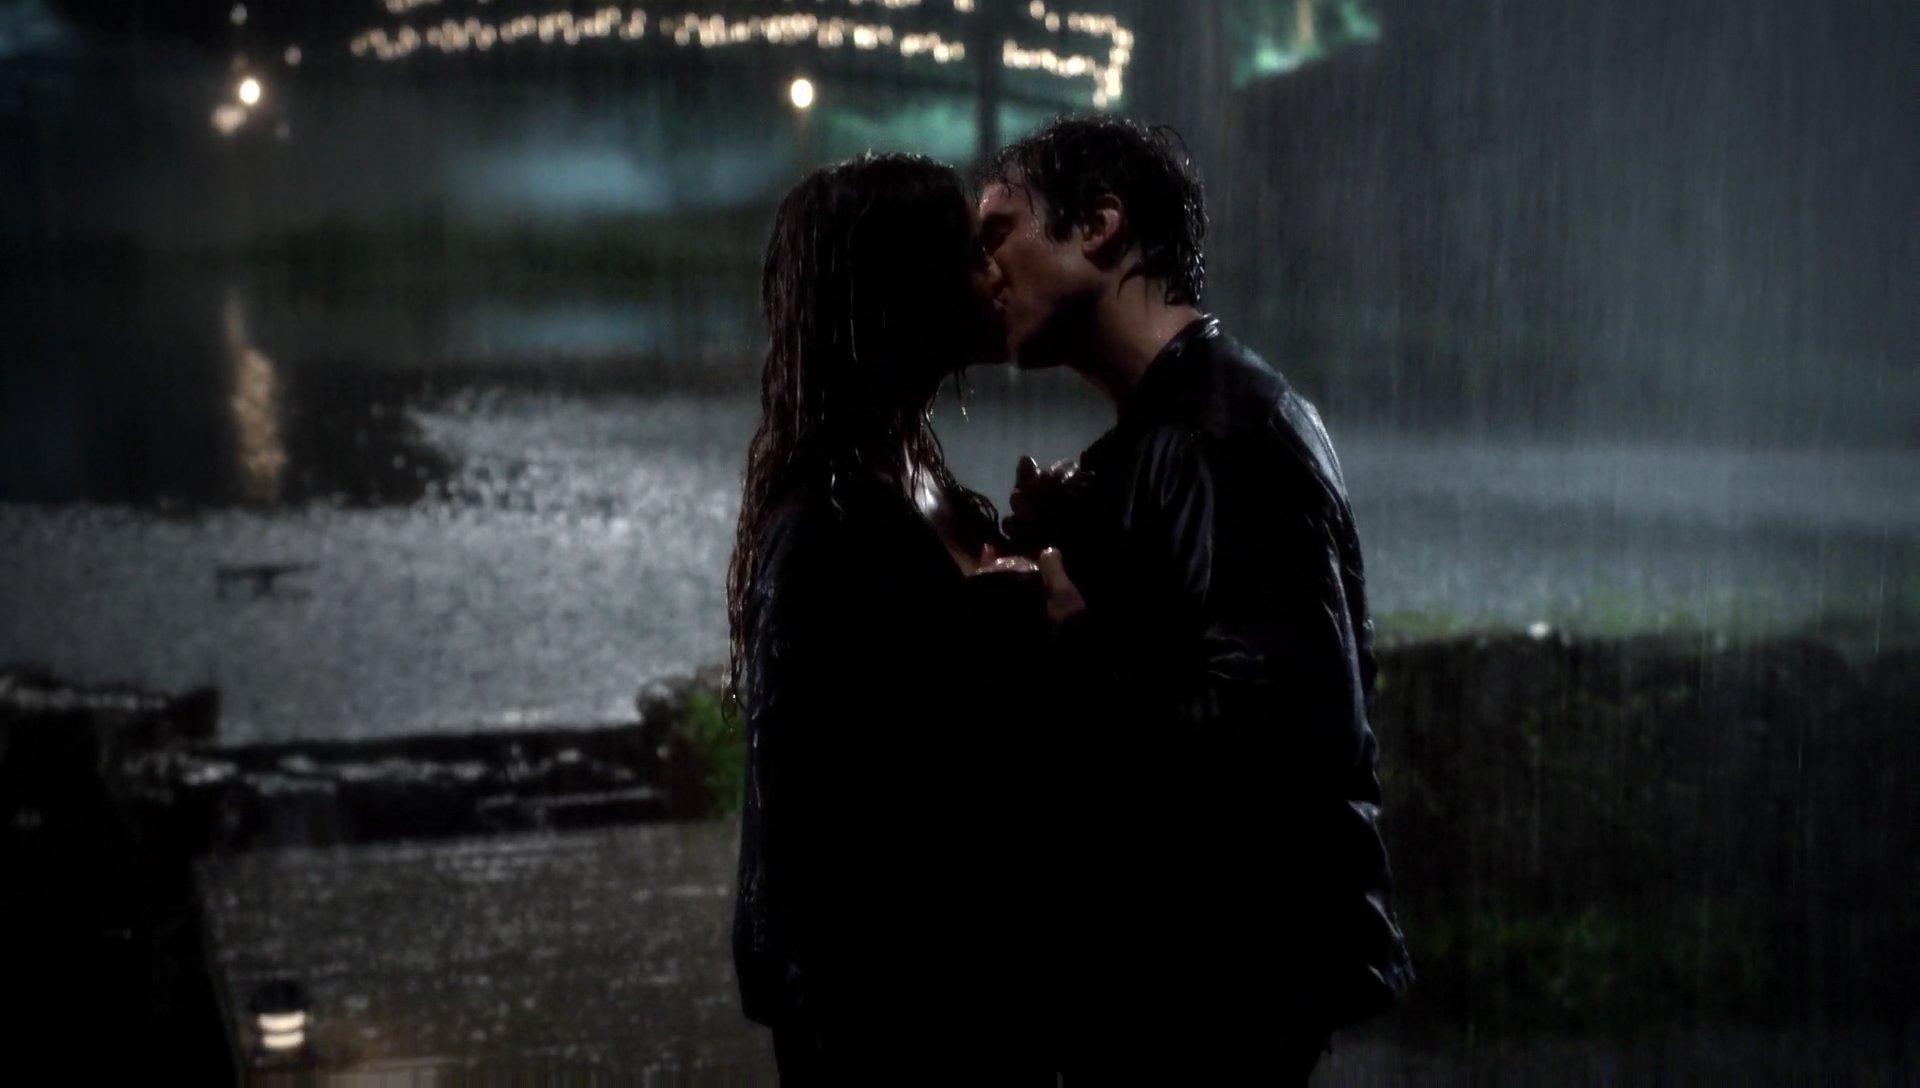 TVD Do You Remember the First Time? Recap: A Delena Rain